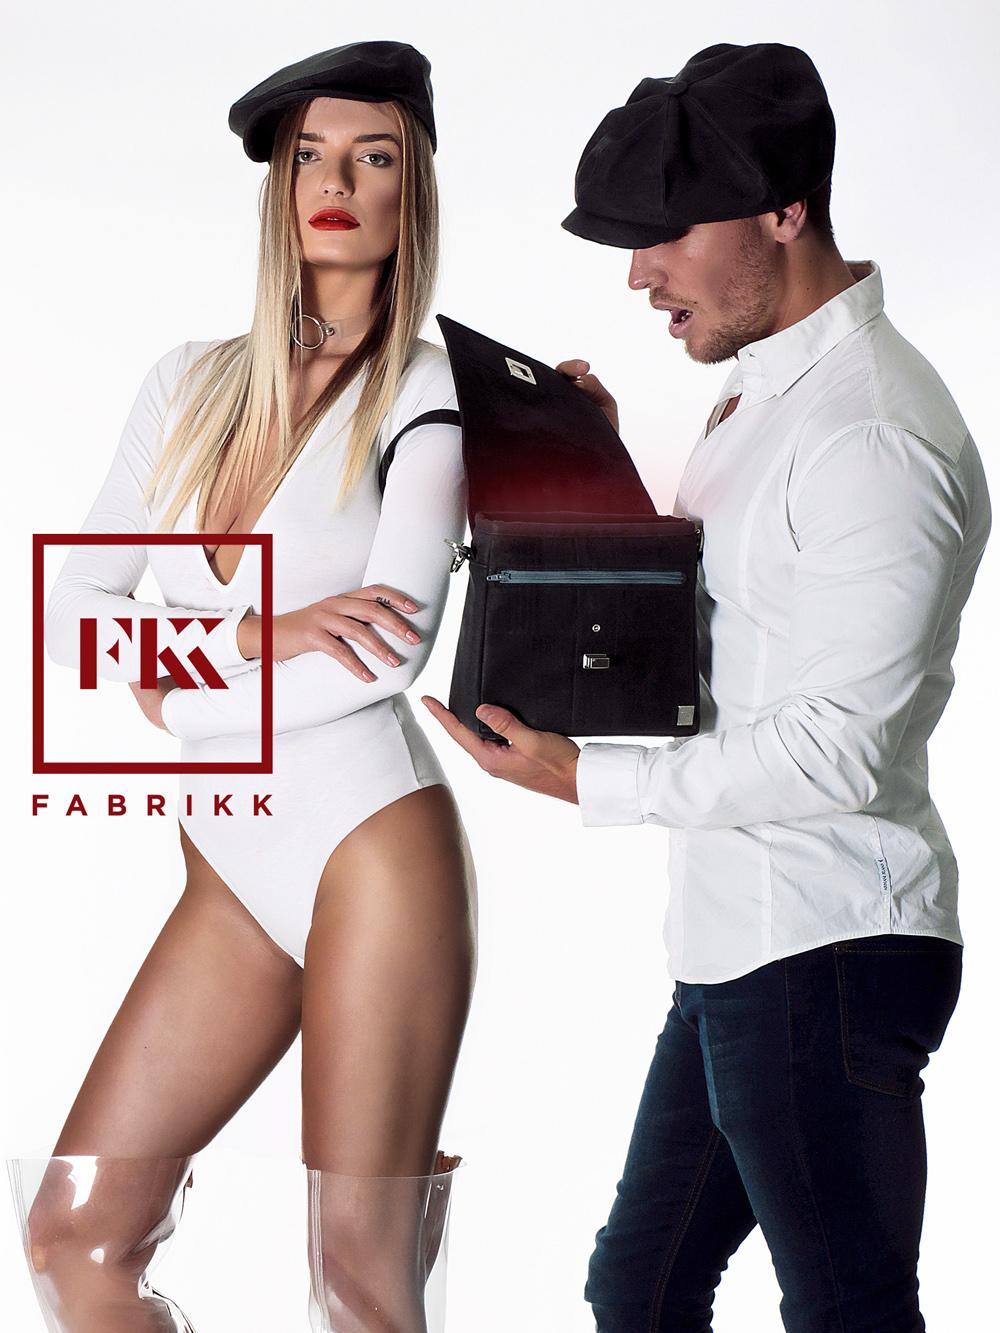 Fabrikk campaign SS17 ft Tom Zanetti and Anna Tyburska shot by Studio Voir 11